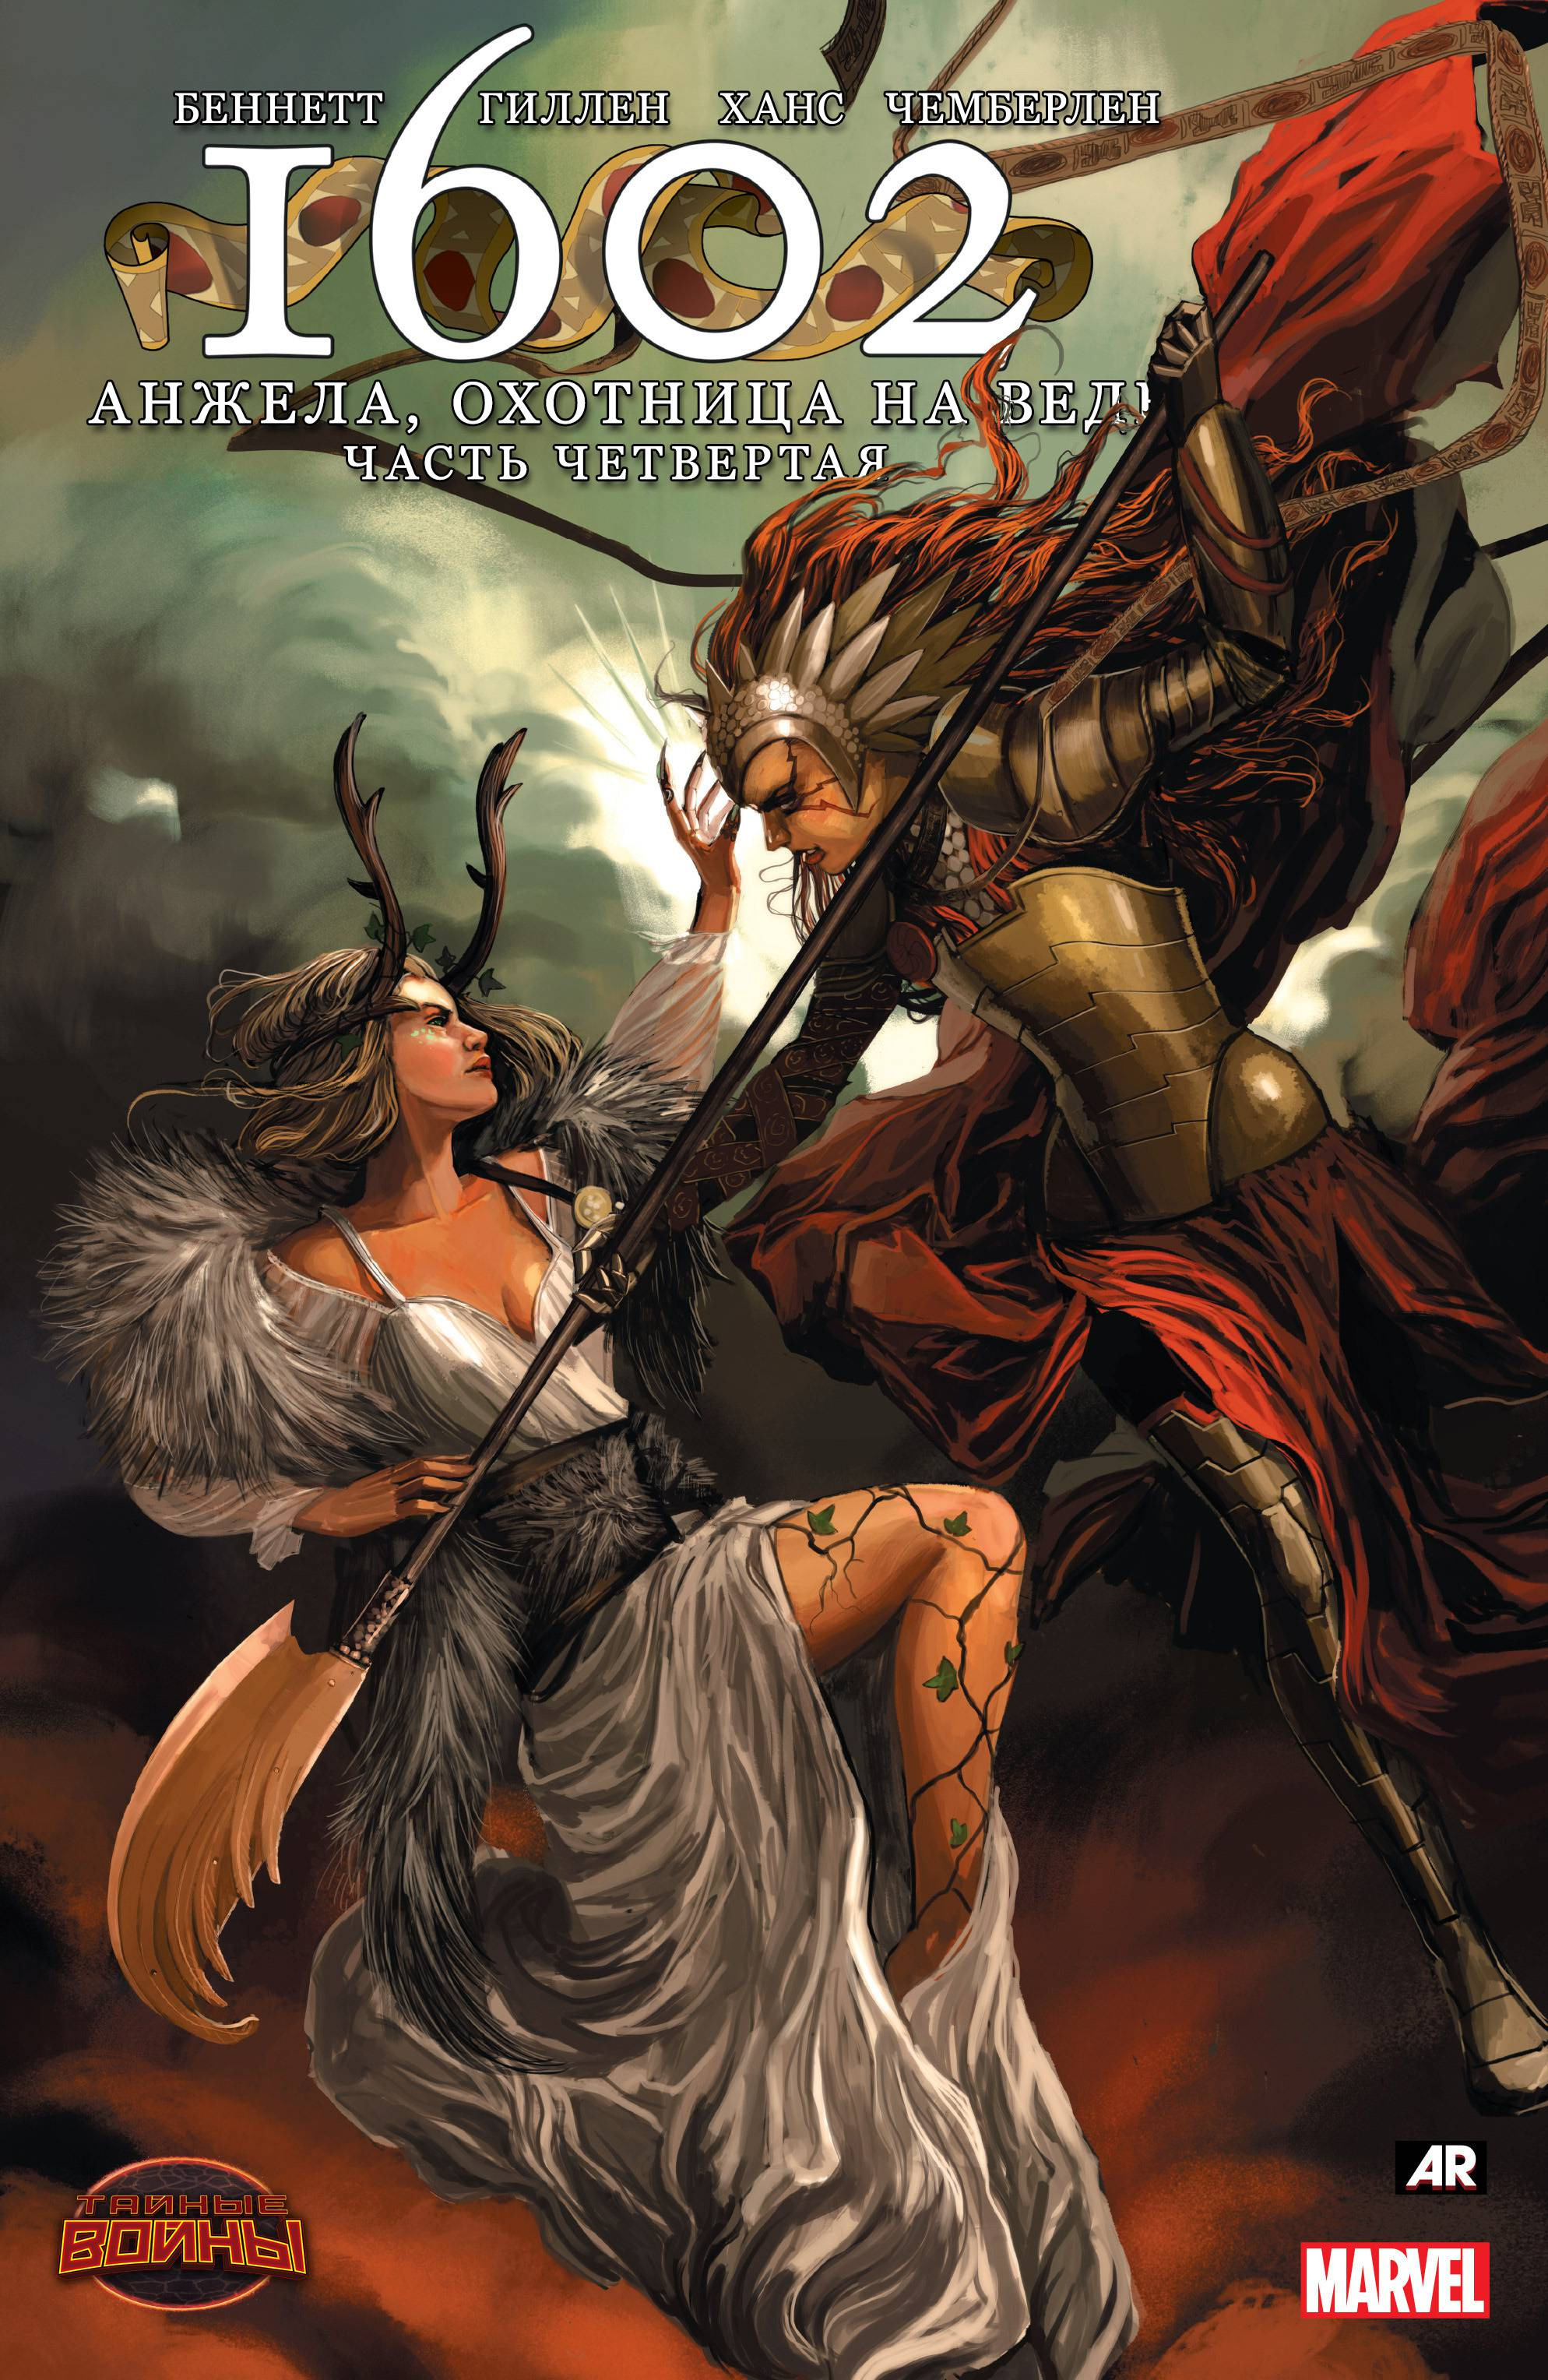 1602 Ангела, Охотница На Ведьм №4 онлайн